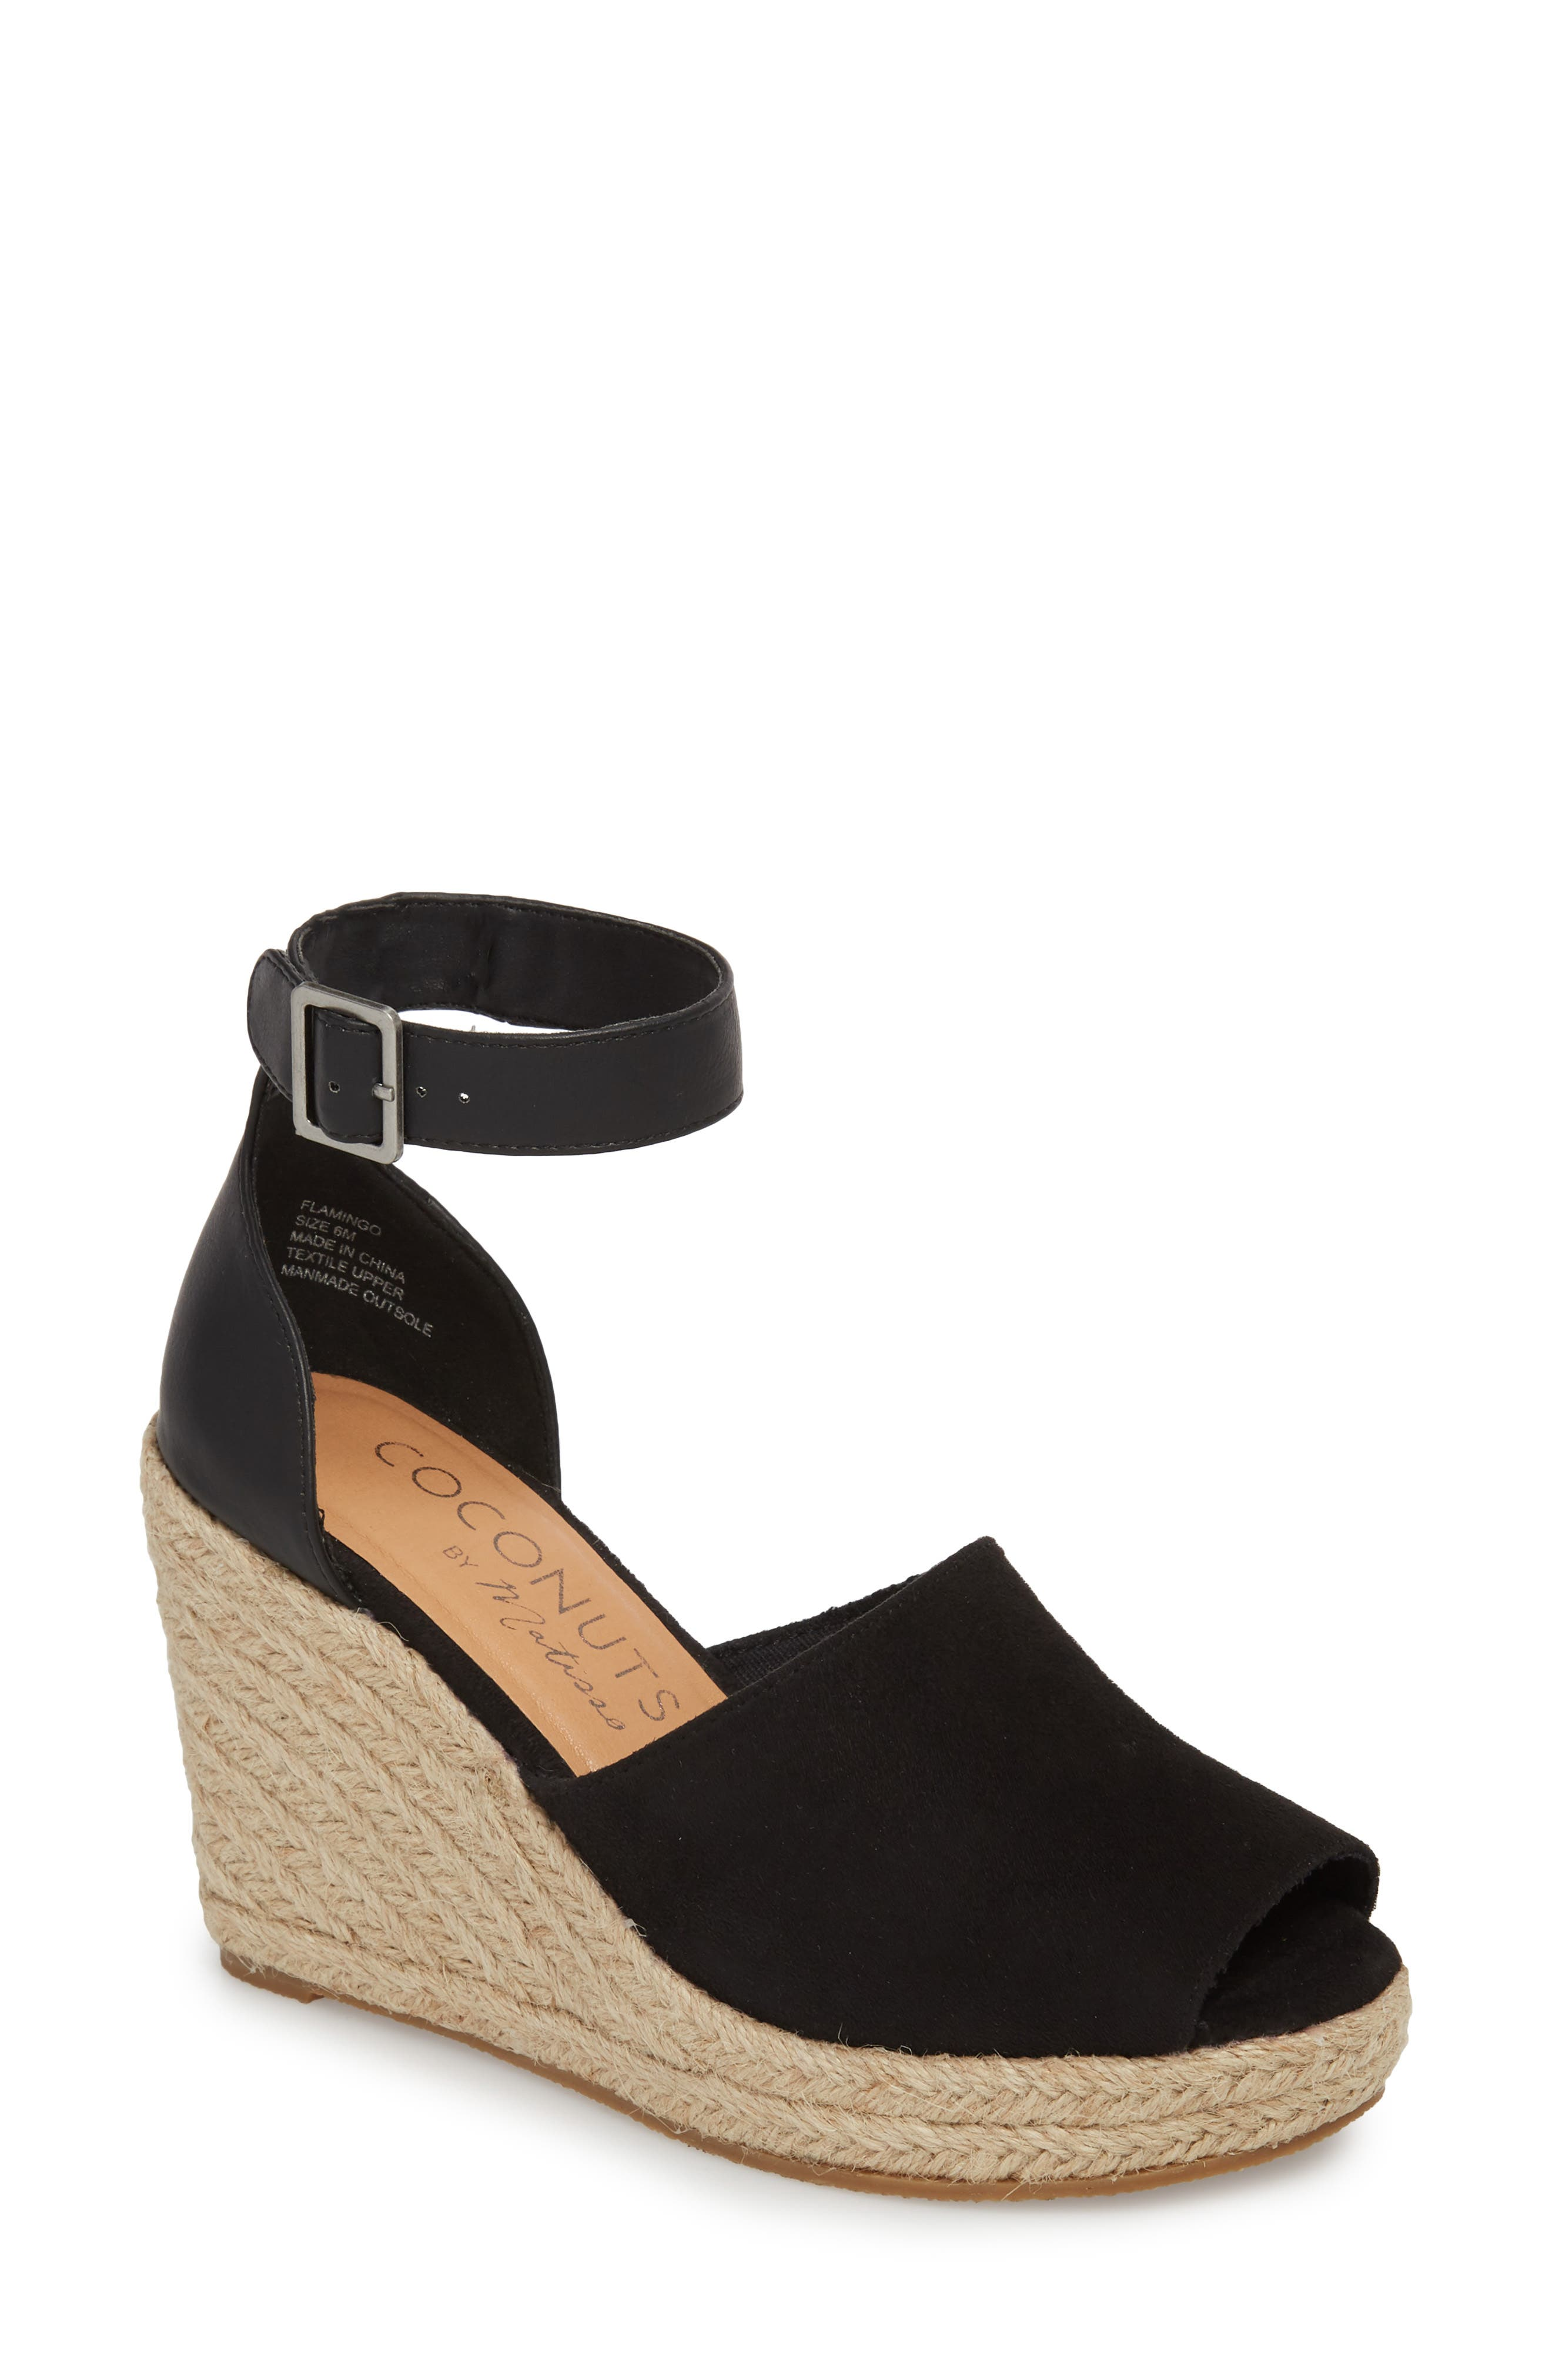 Flamingo Wedge Sandal,                             Main thumbnail 1, color,                             Black Suede